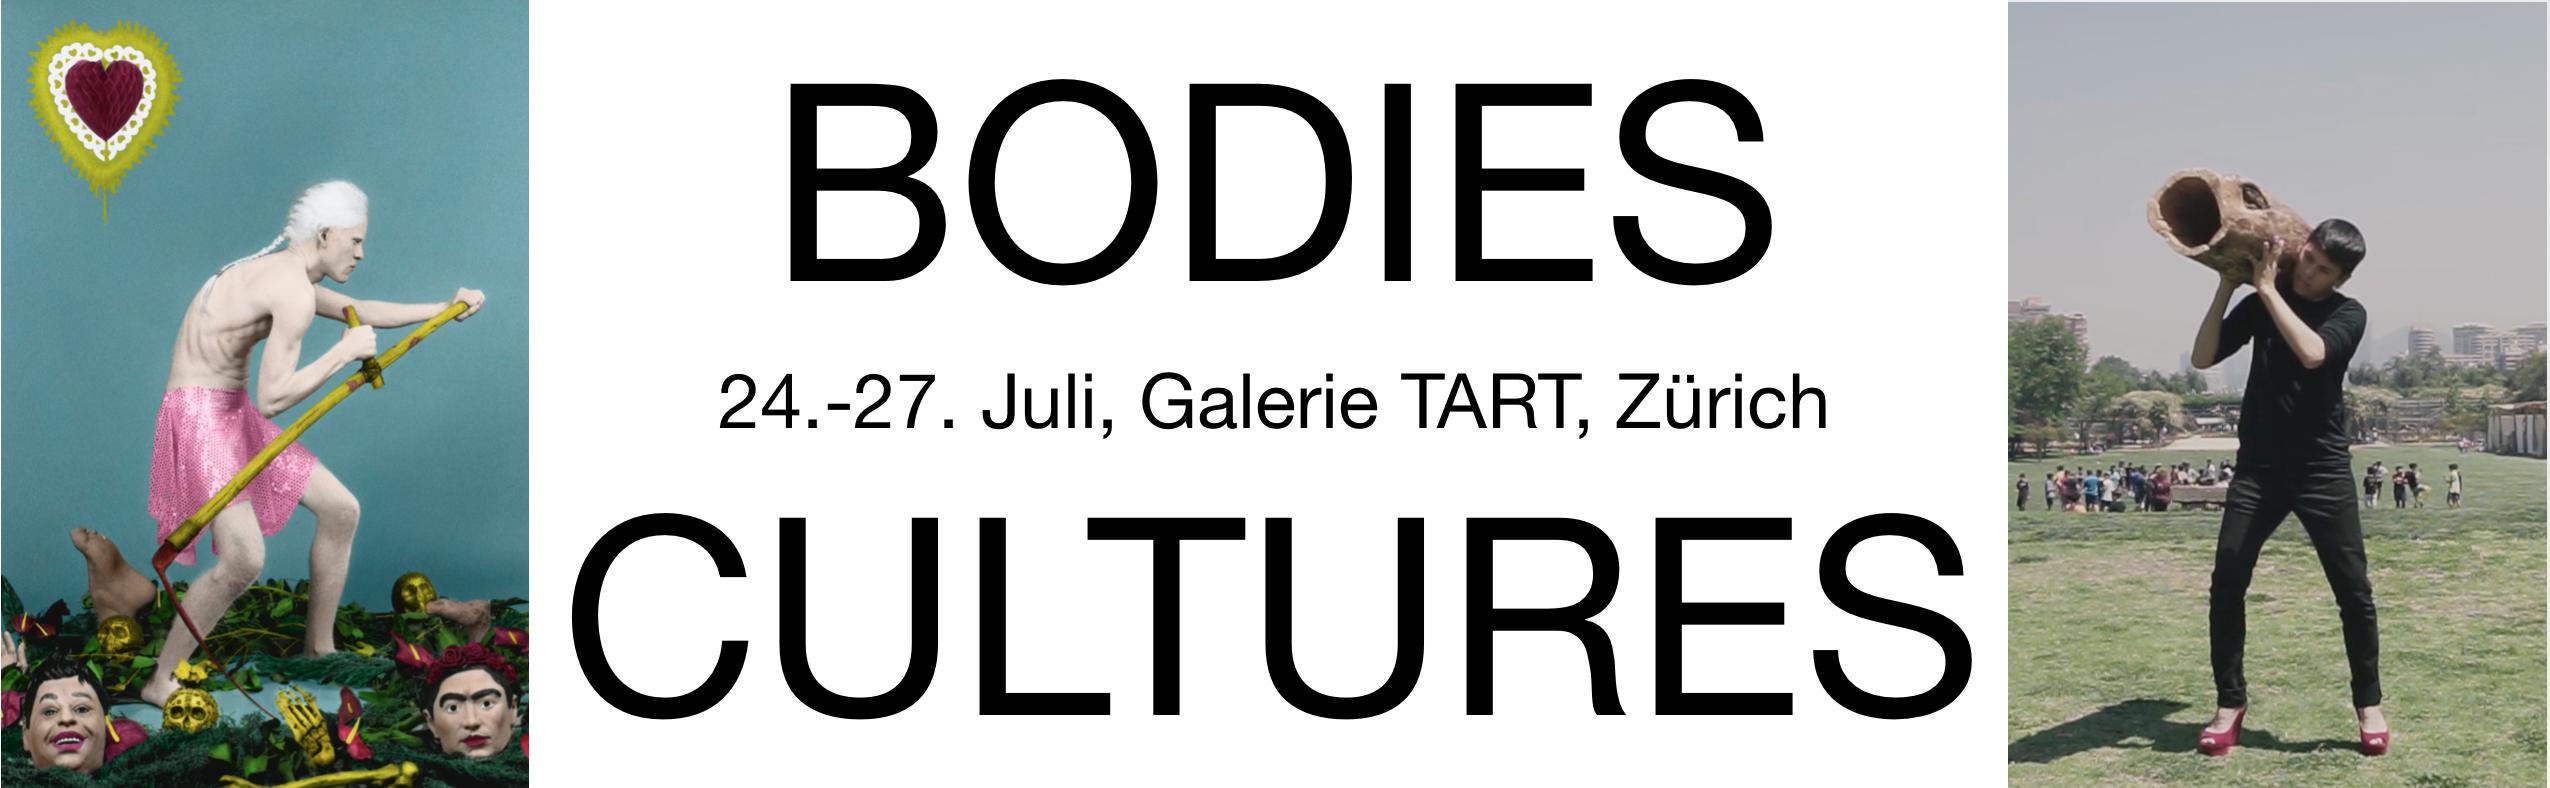 Plakat Bodies Cultures @Tart